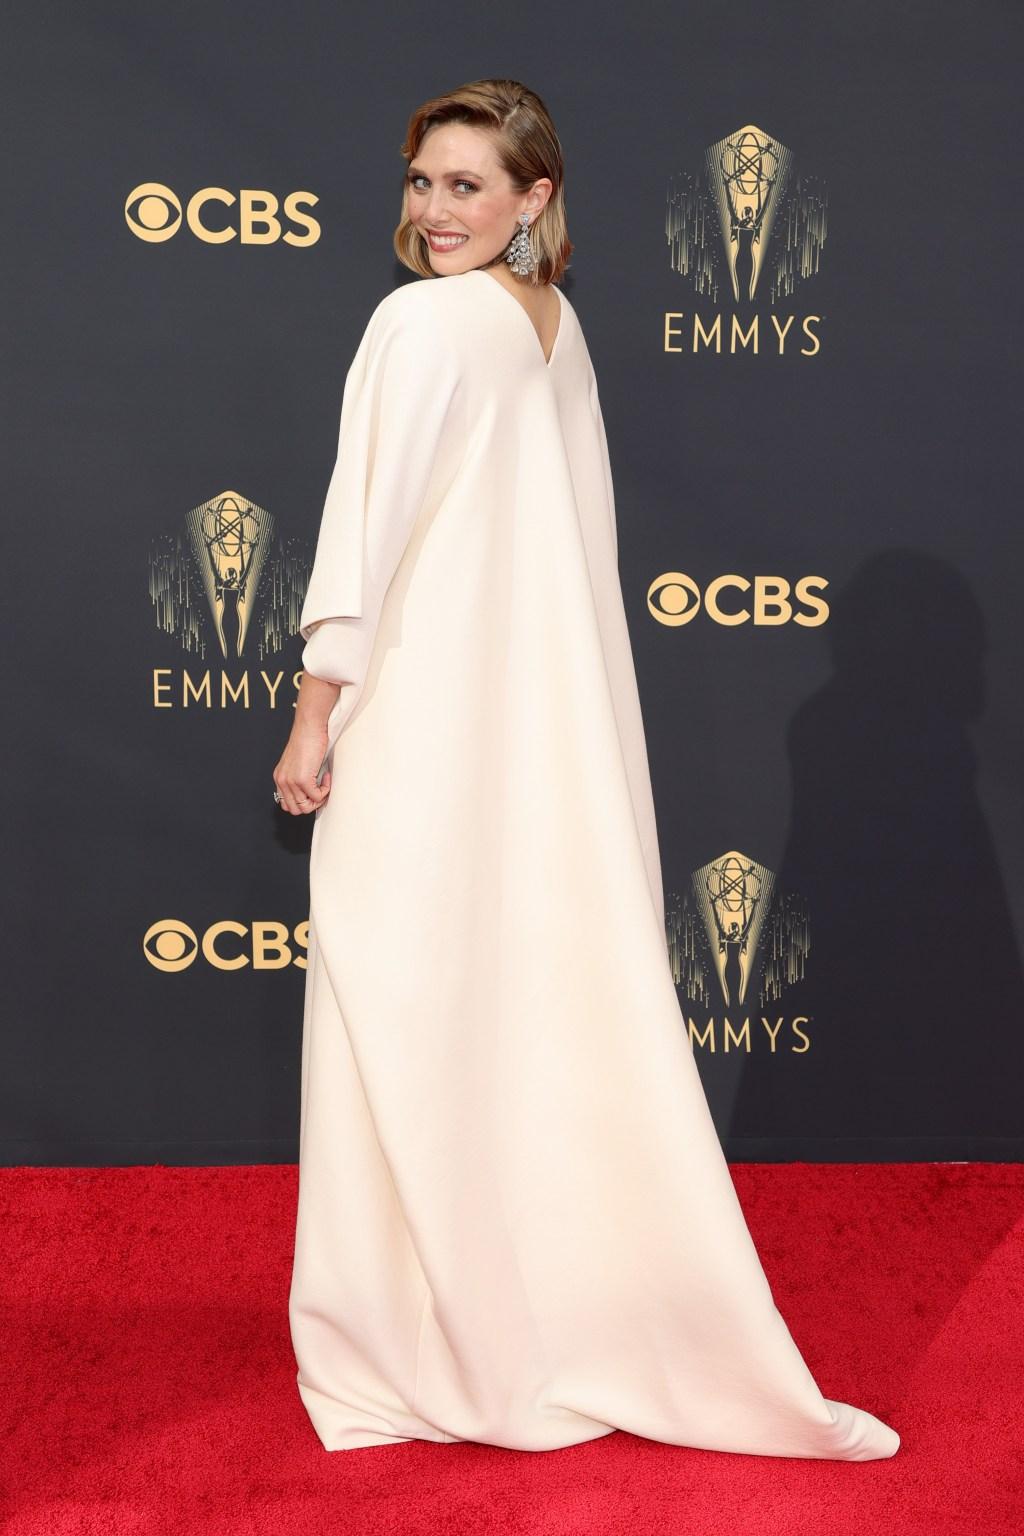 Elizabeth Olsen The Row